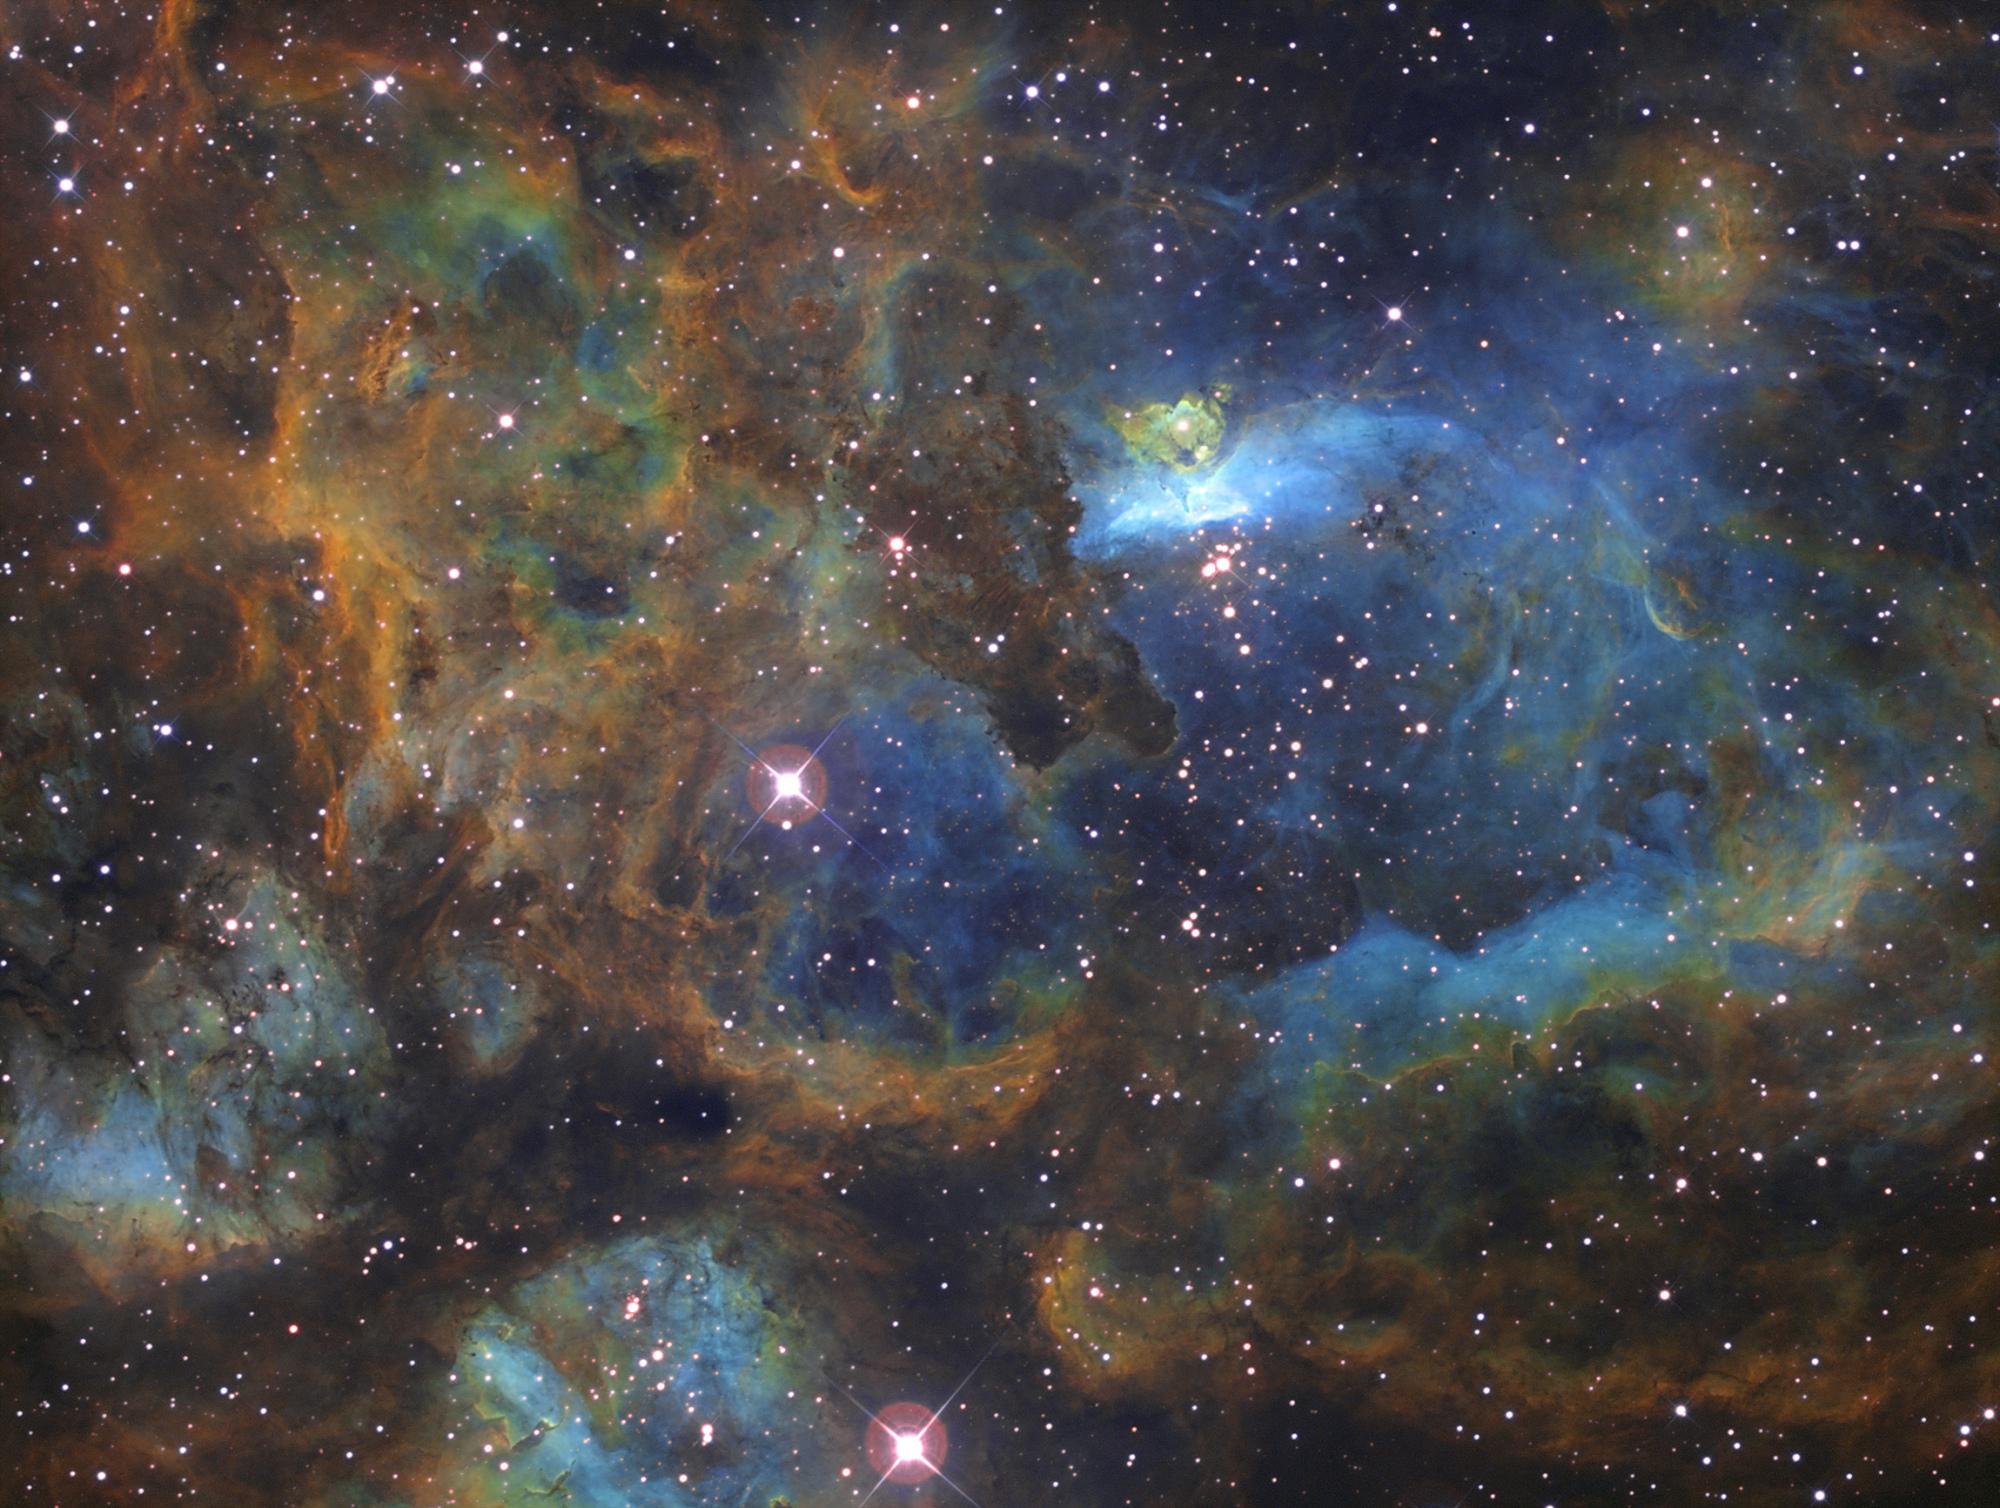 NGC6357-SHO-SHO-V1-Bin2.thumb.jpg.23c77627f982636d00fde5d522c4e0e0.jpg